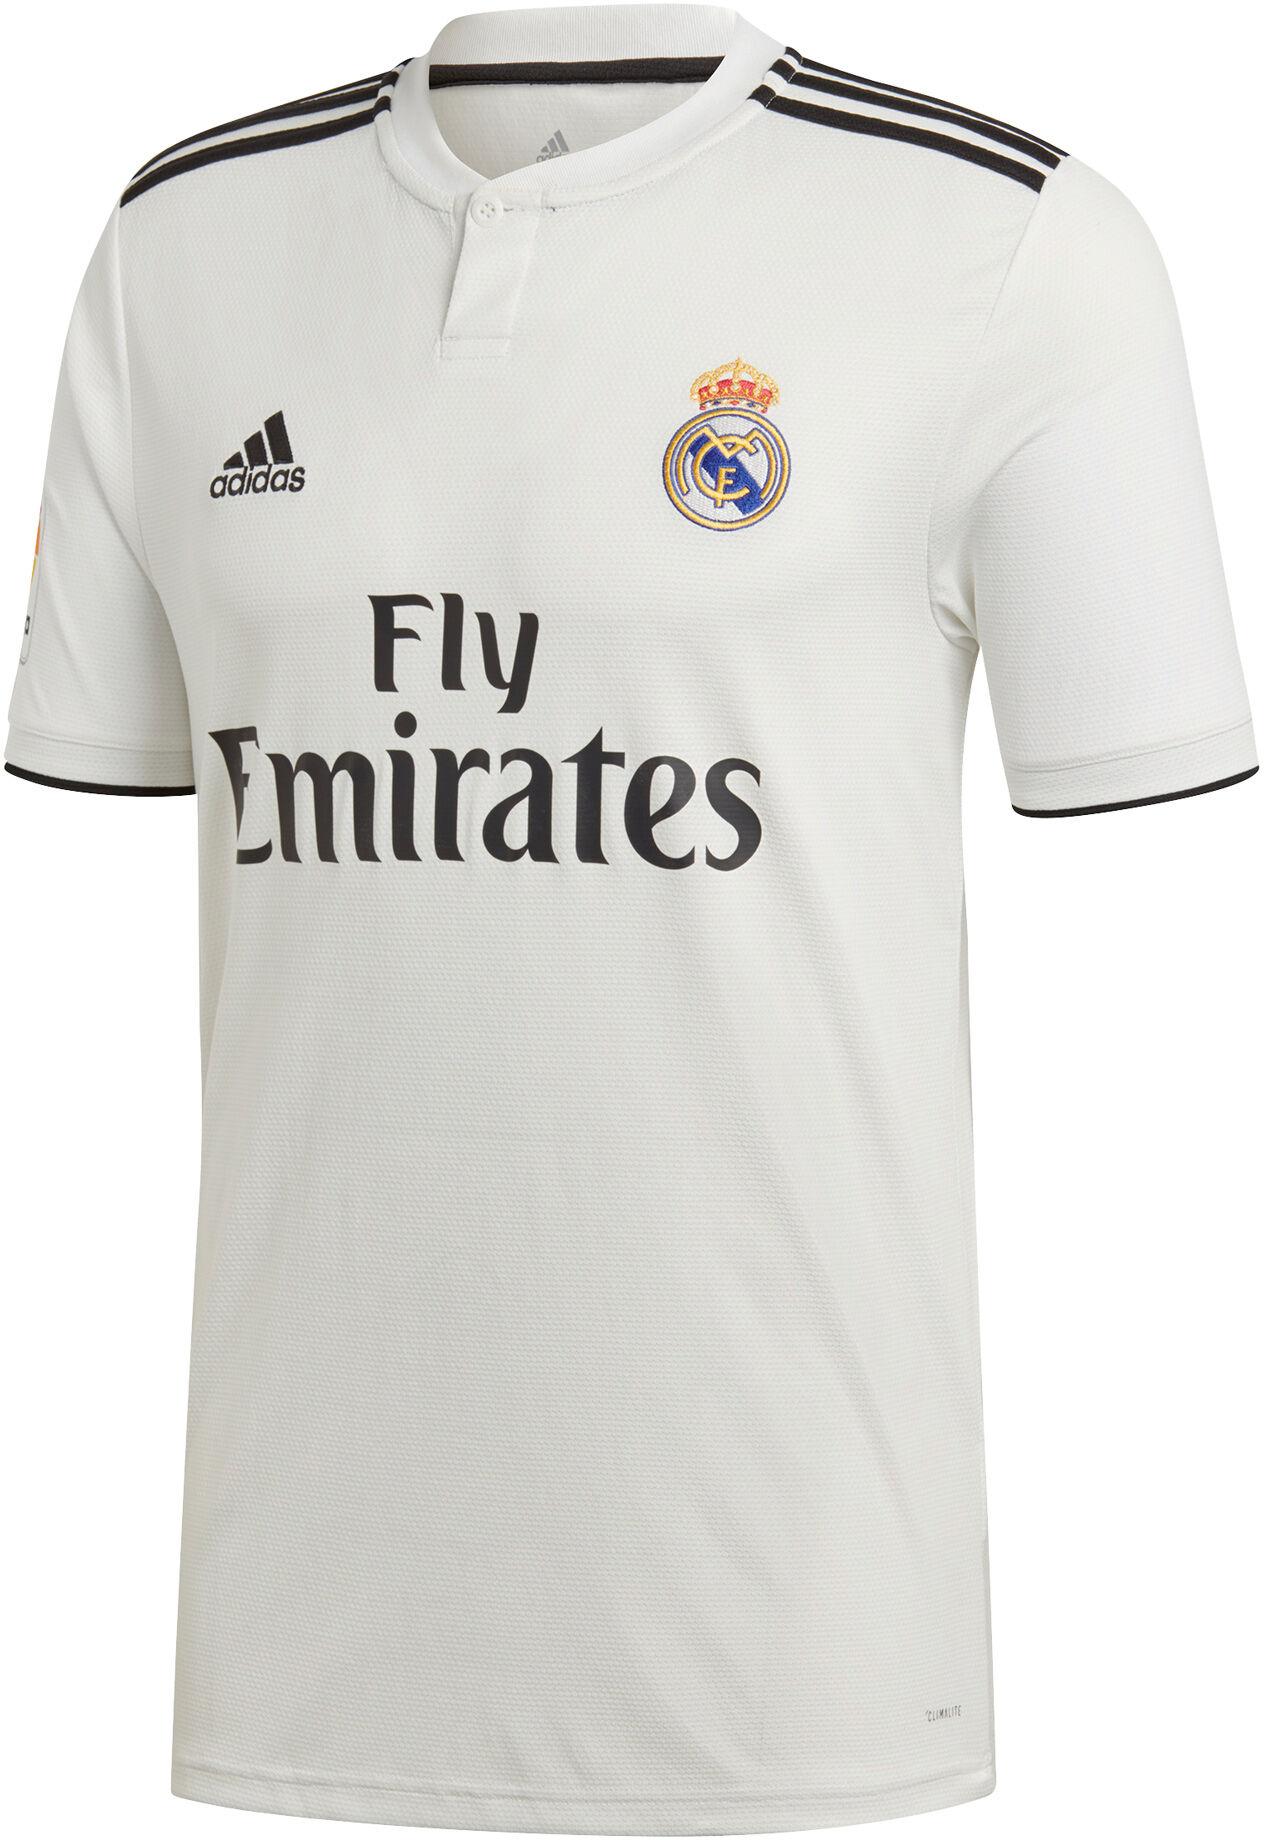 2018 Fútbol Adidas Real Camiseta Madrid 2019 Temporada Lfp Jsy H qXwt7v b599086cfd46e